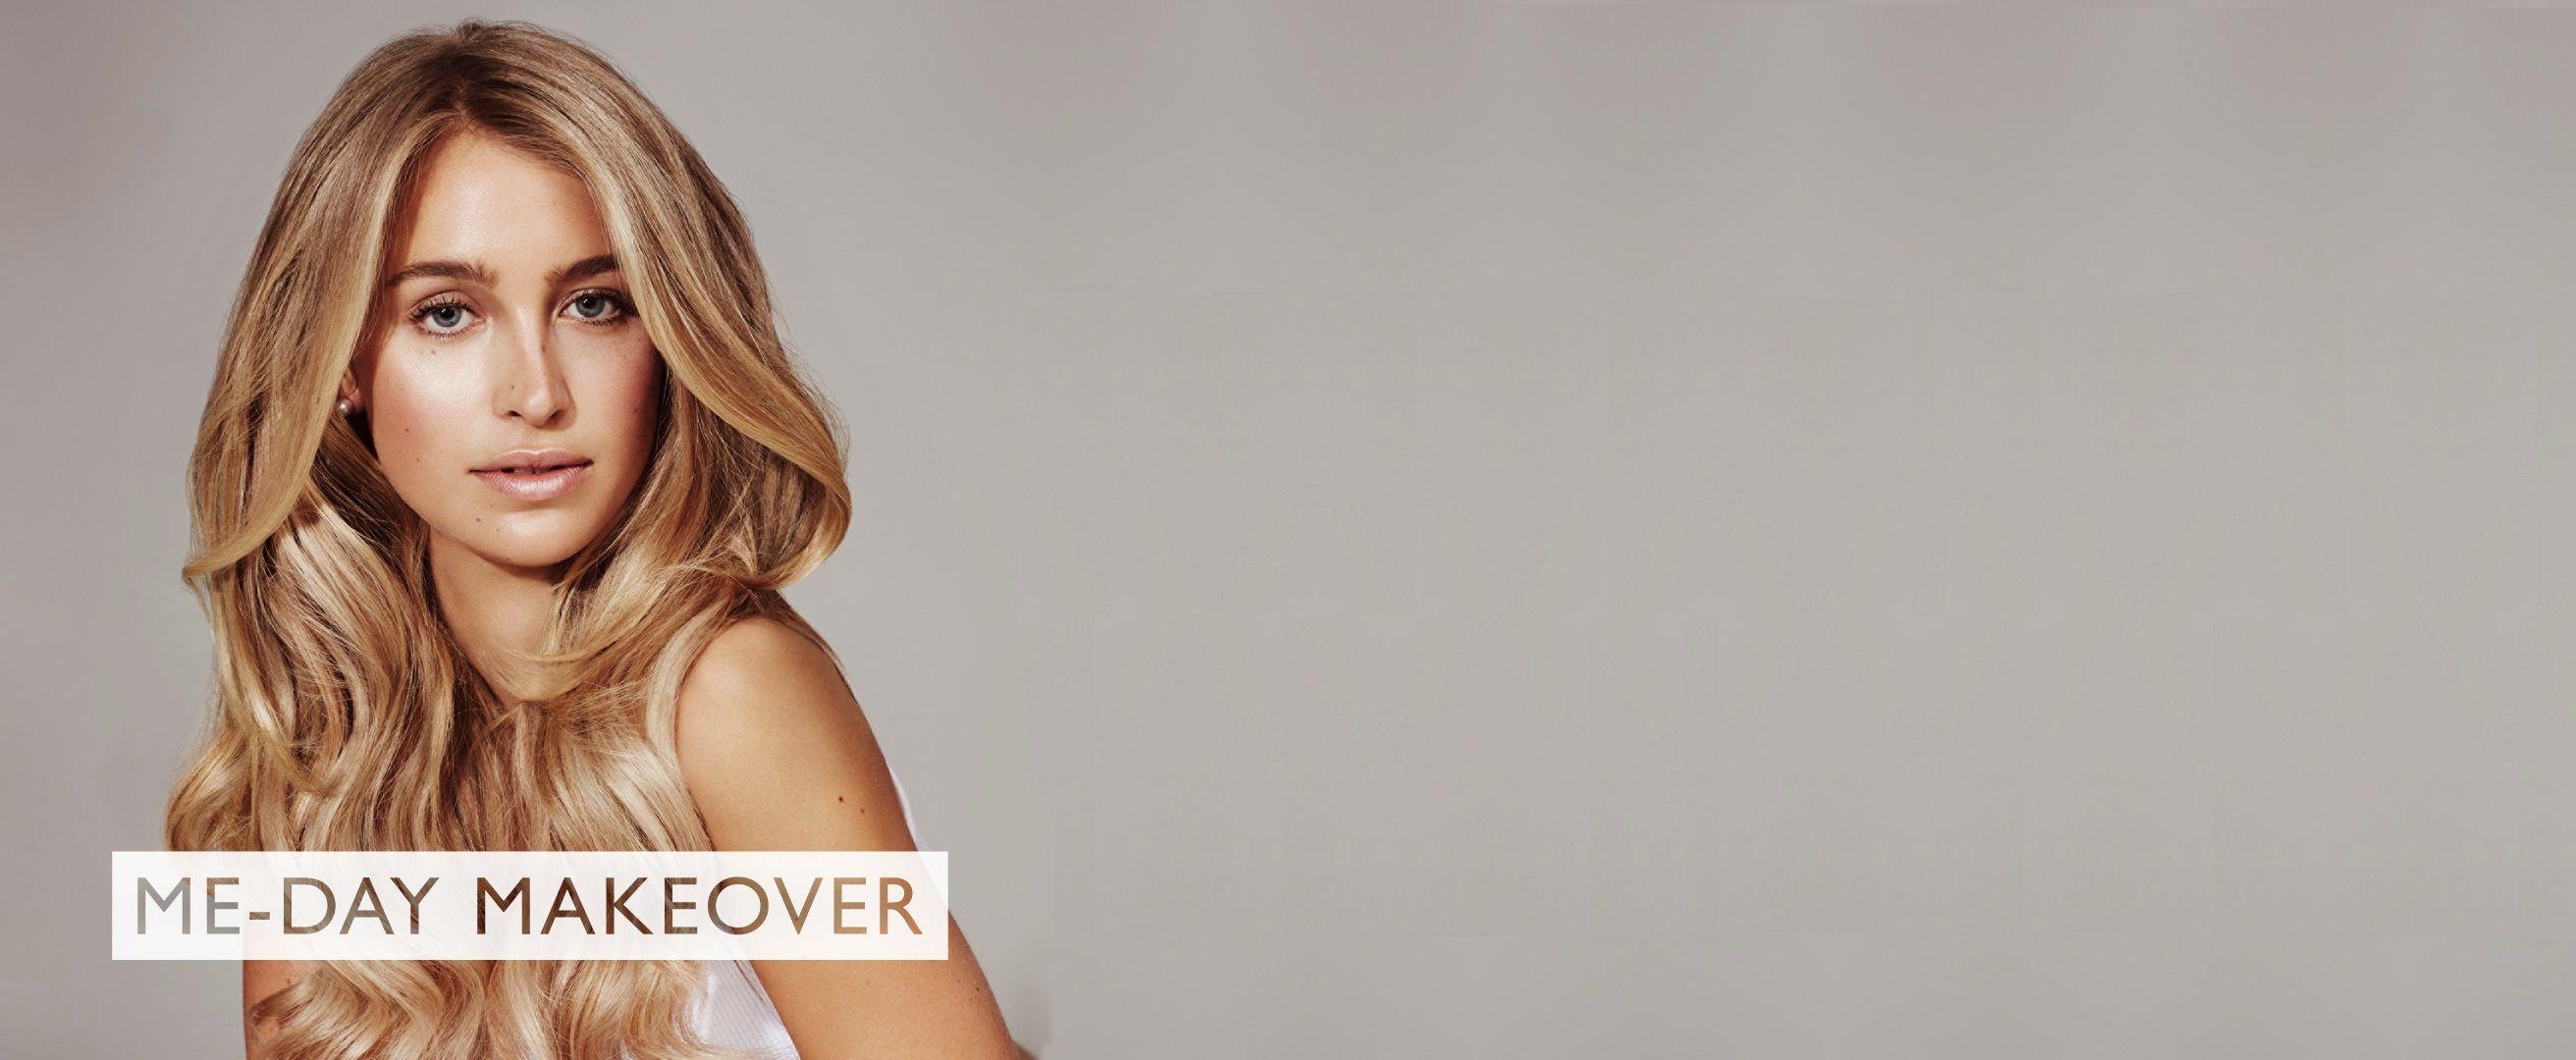 homepage-banner-ne-day-makeover